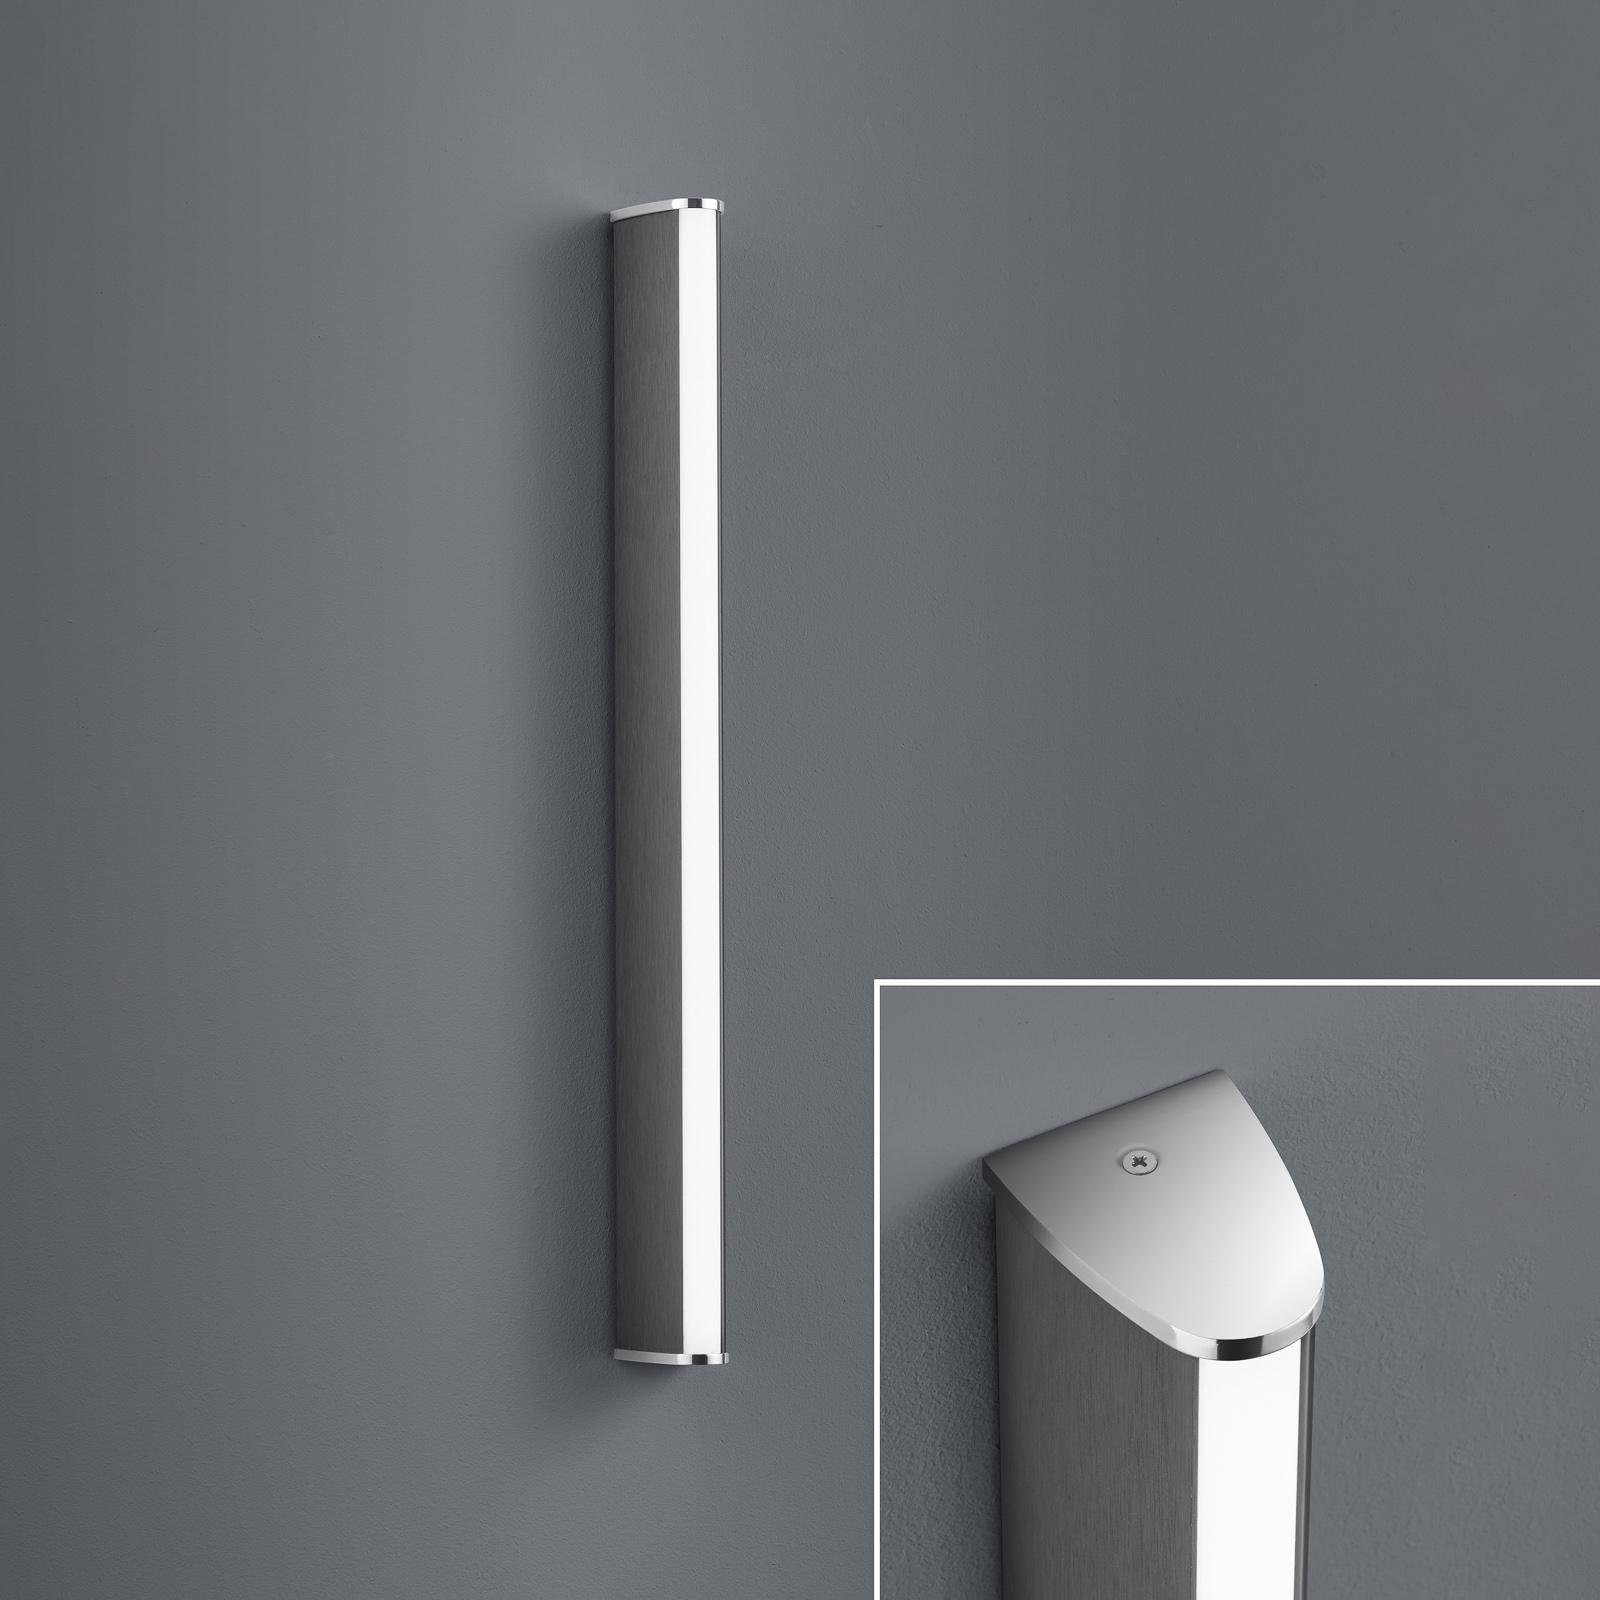 BANKAMP Pure F applique LED 42cm anthracite